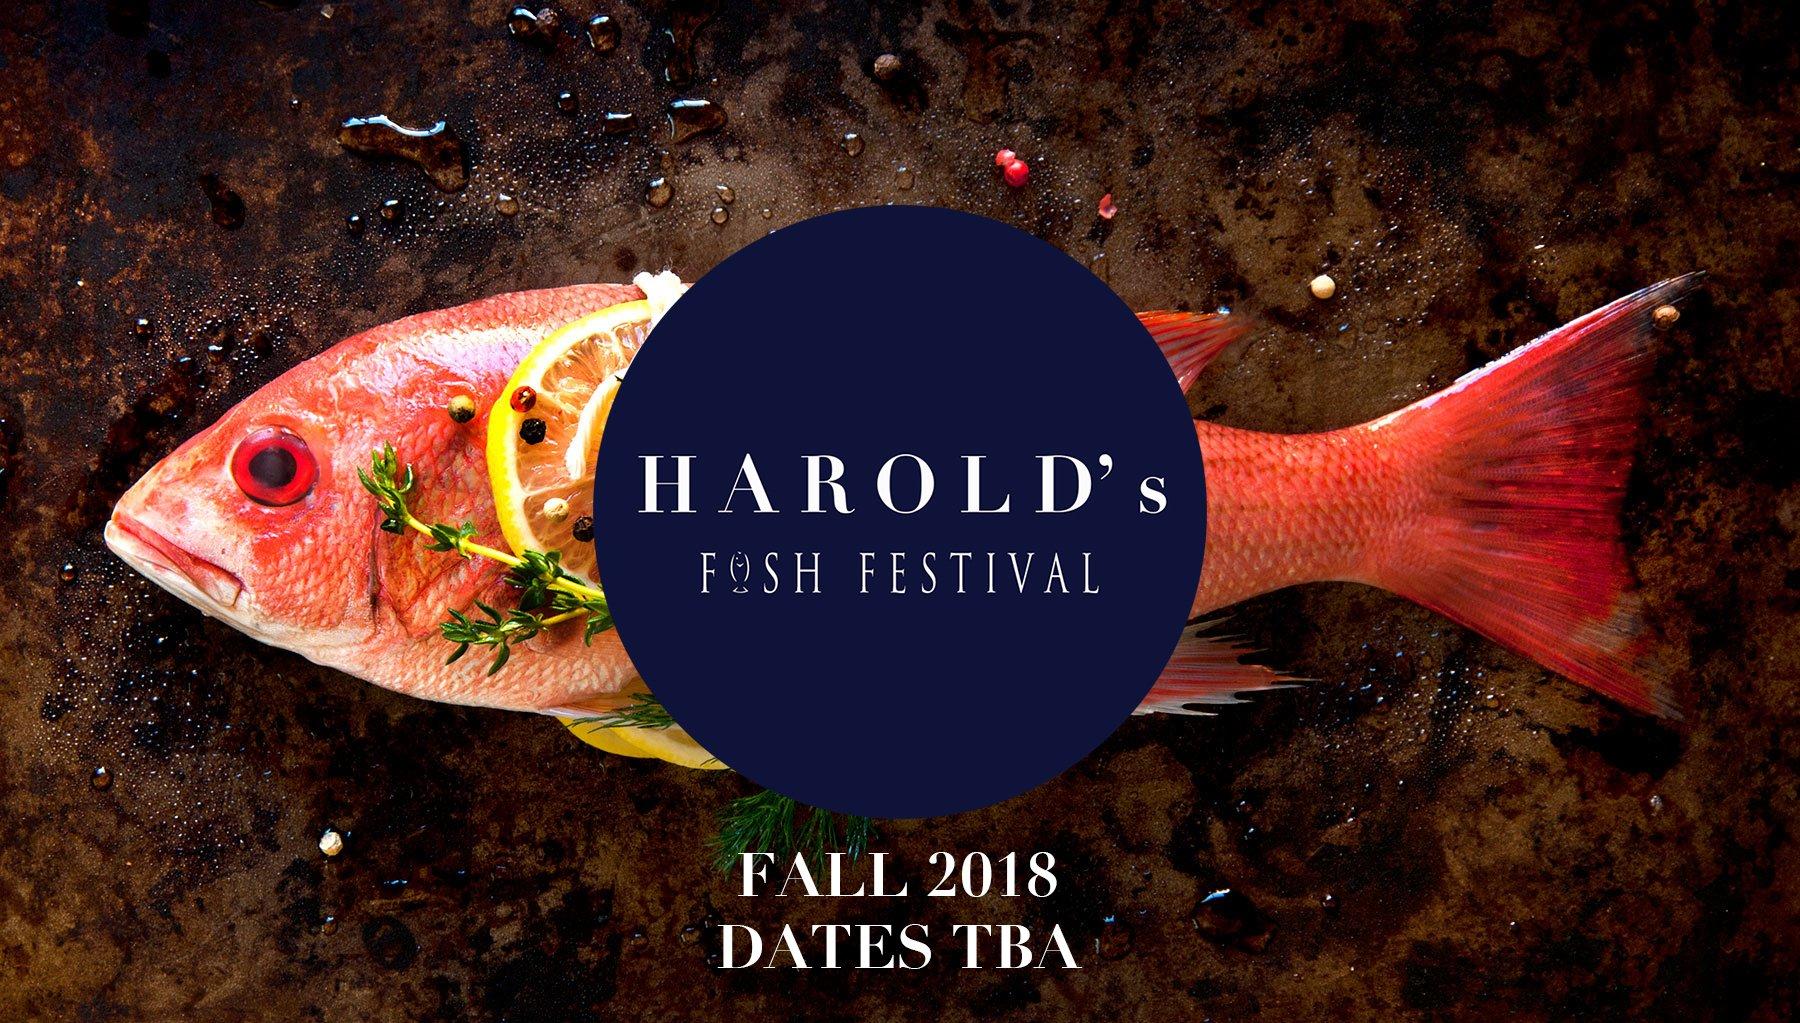 Harold's Fish Festival